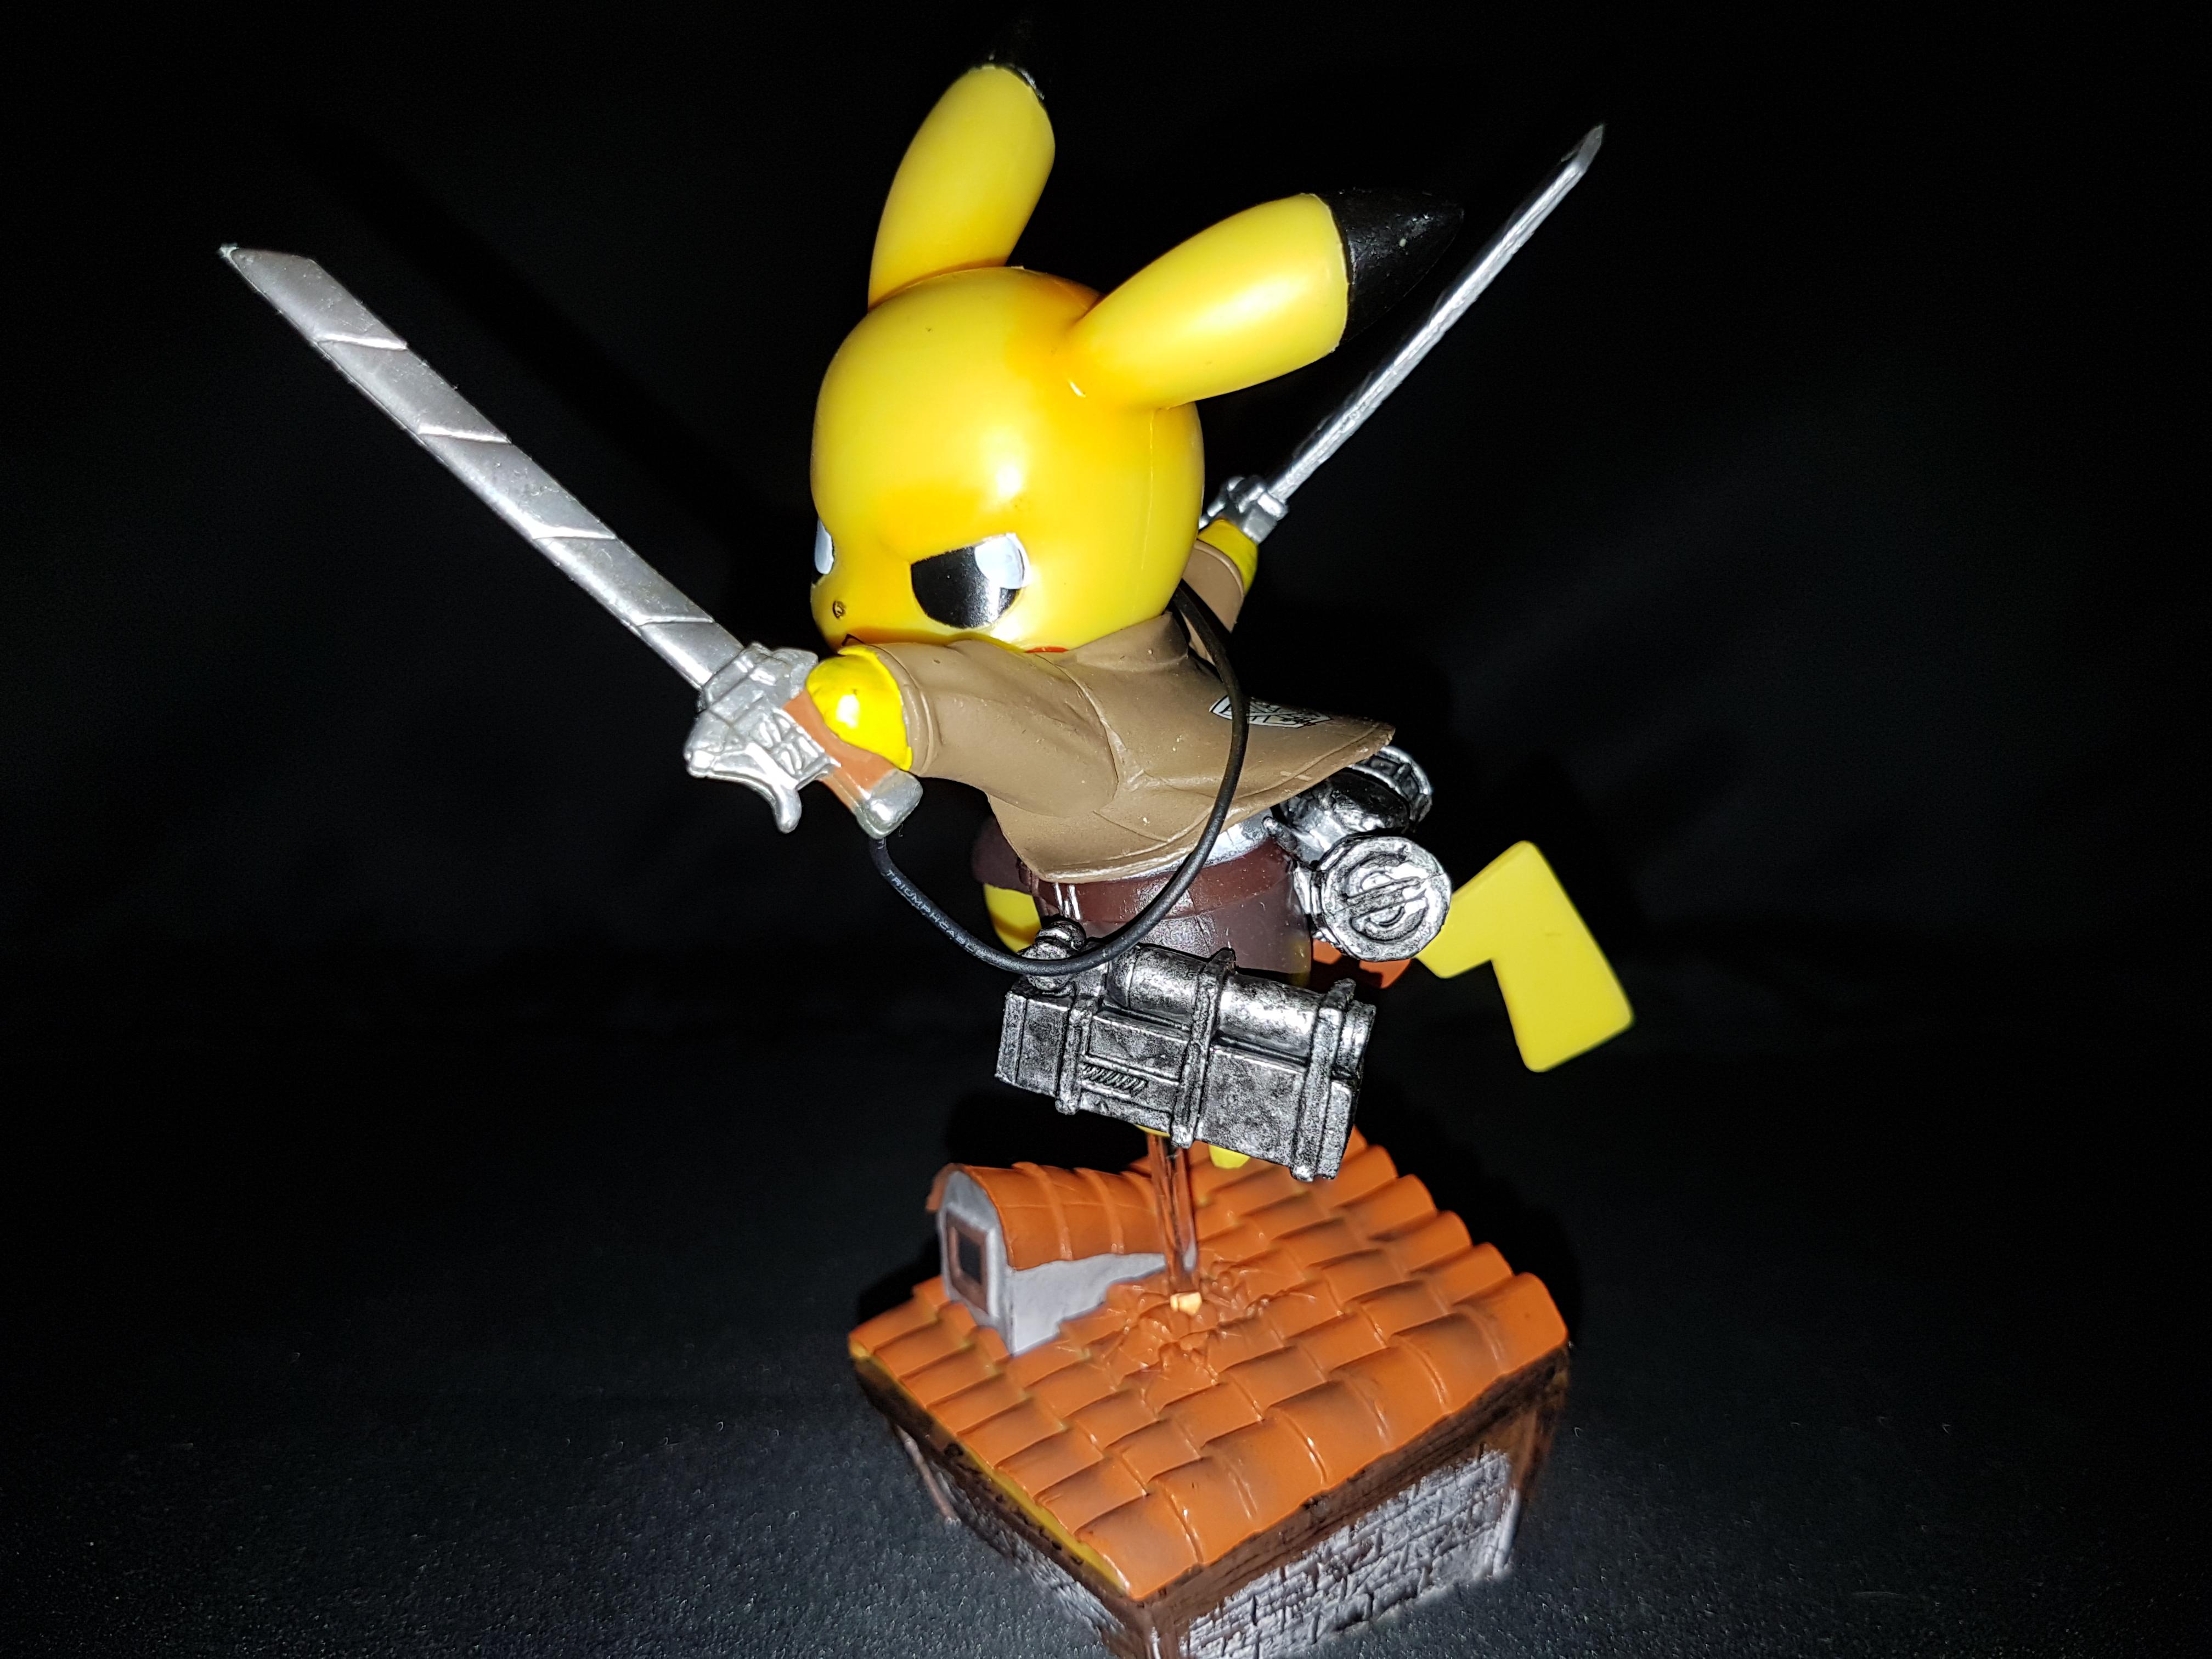 Figurine pikachu attack on titans 3